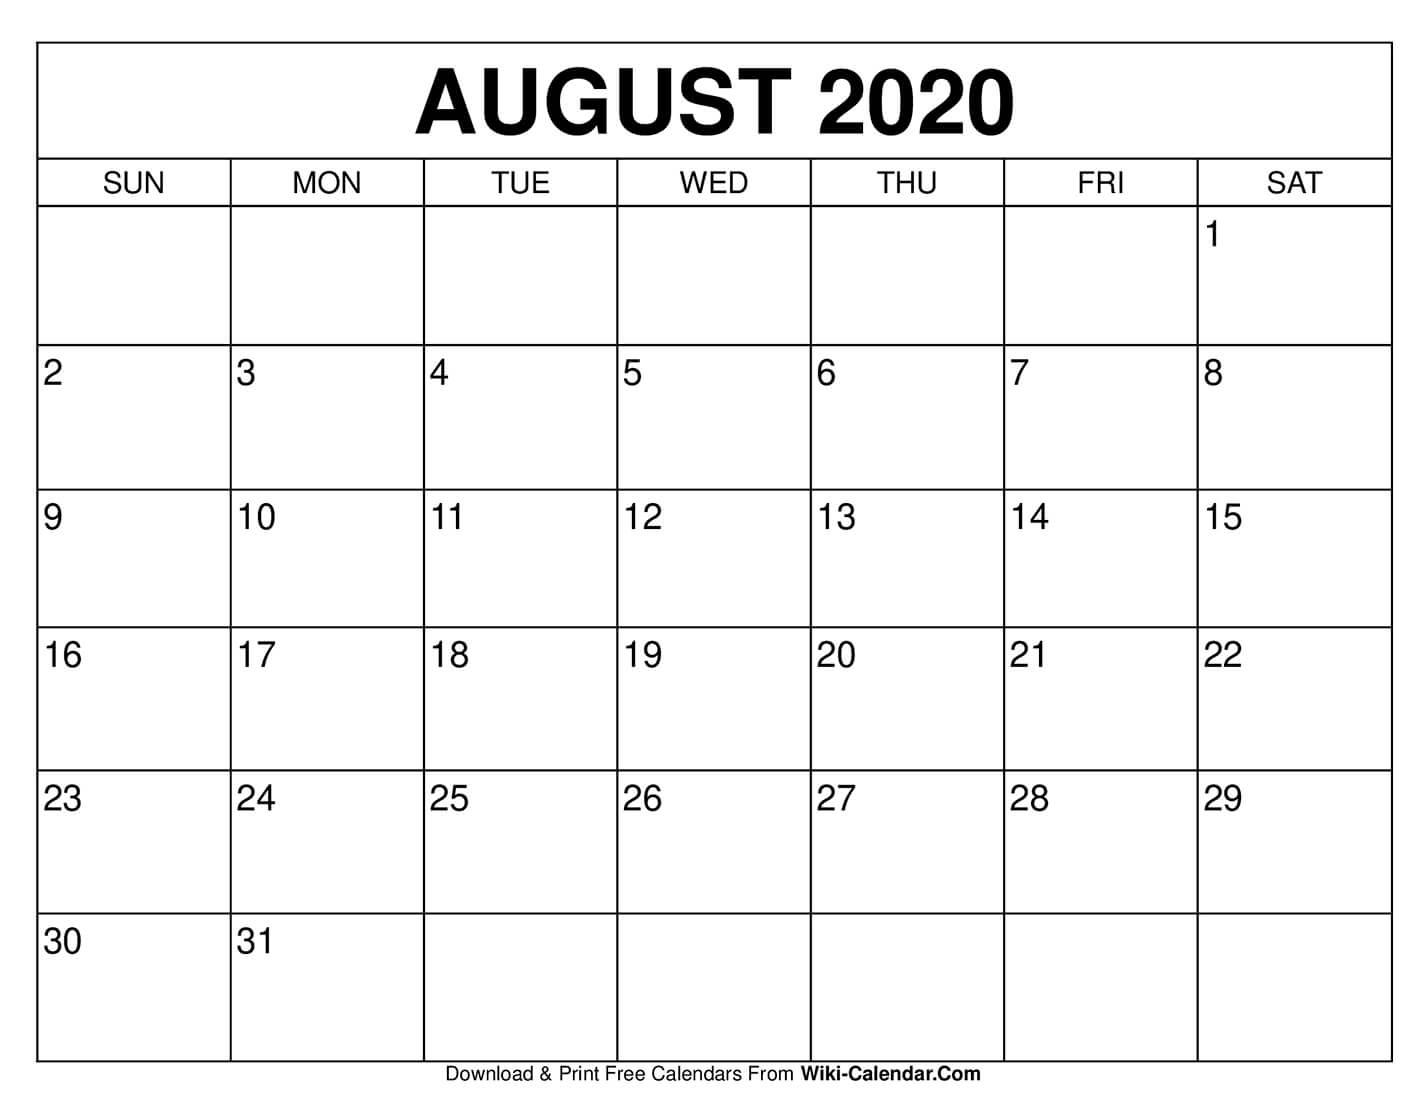 Free Printable August 2020 Calendars